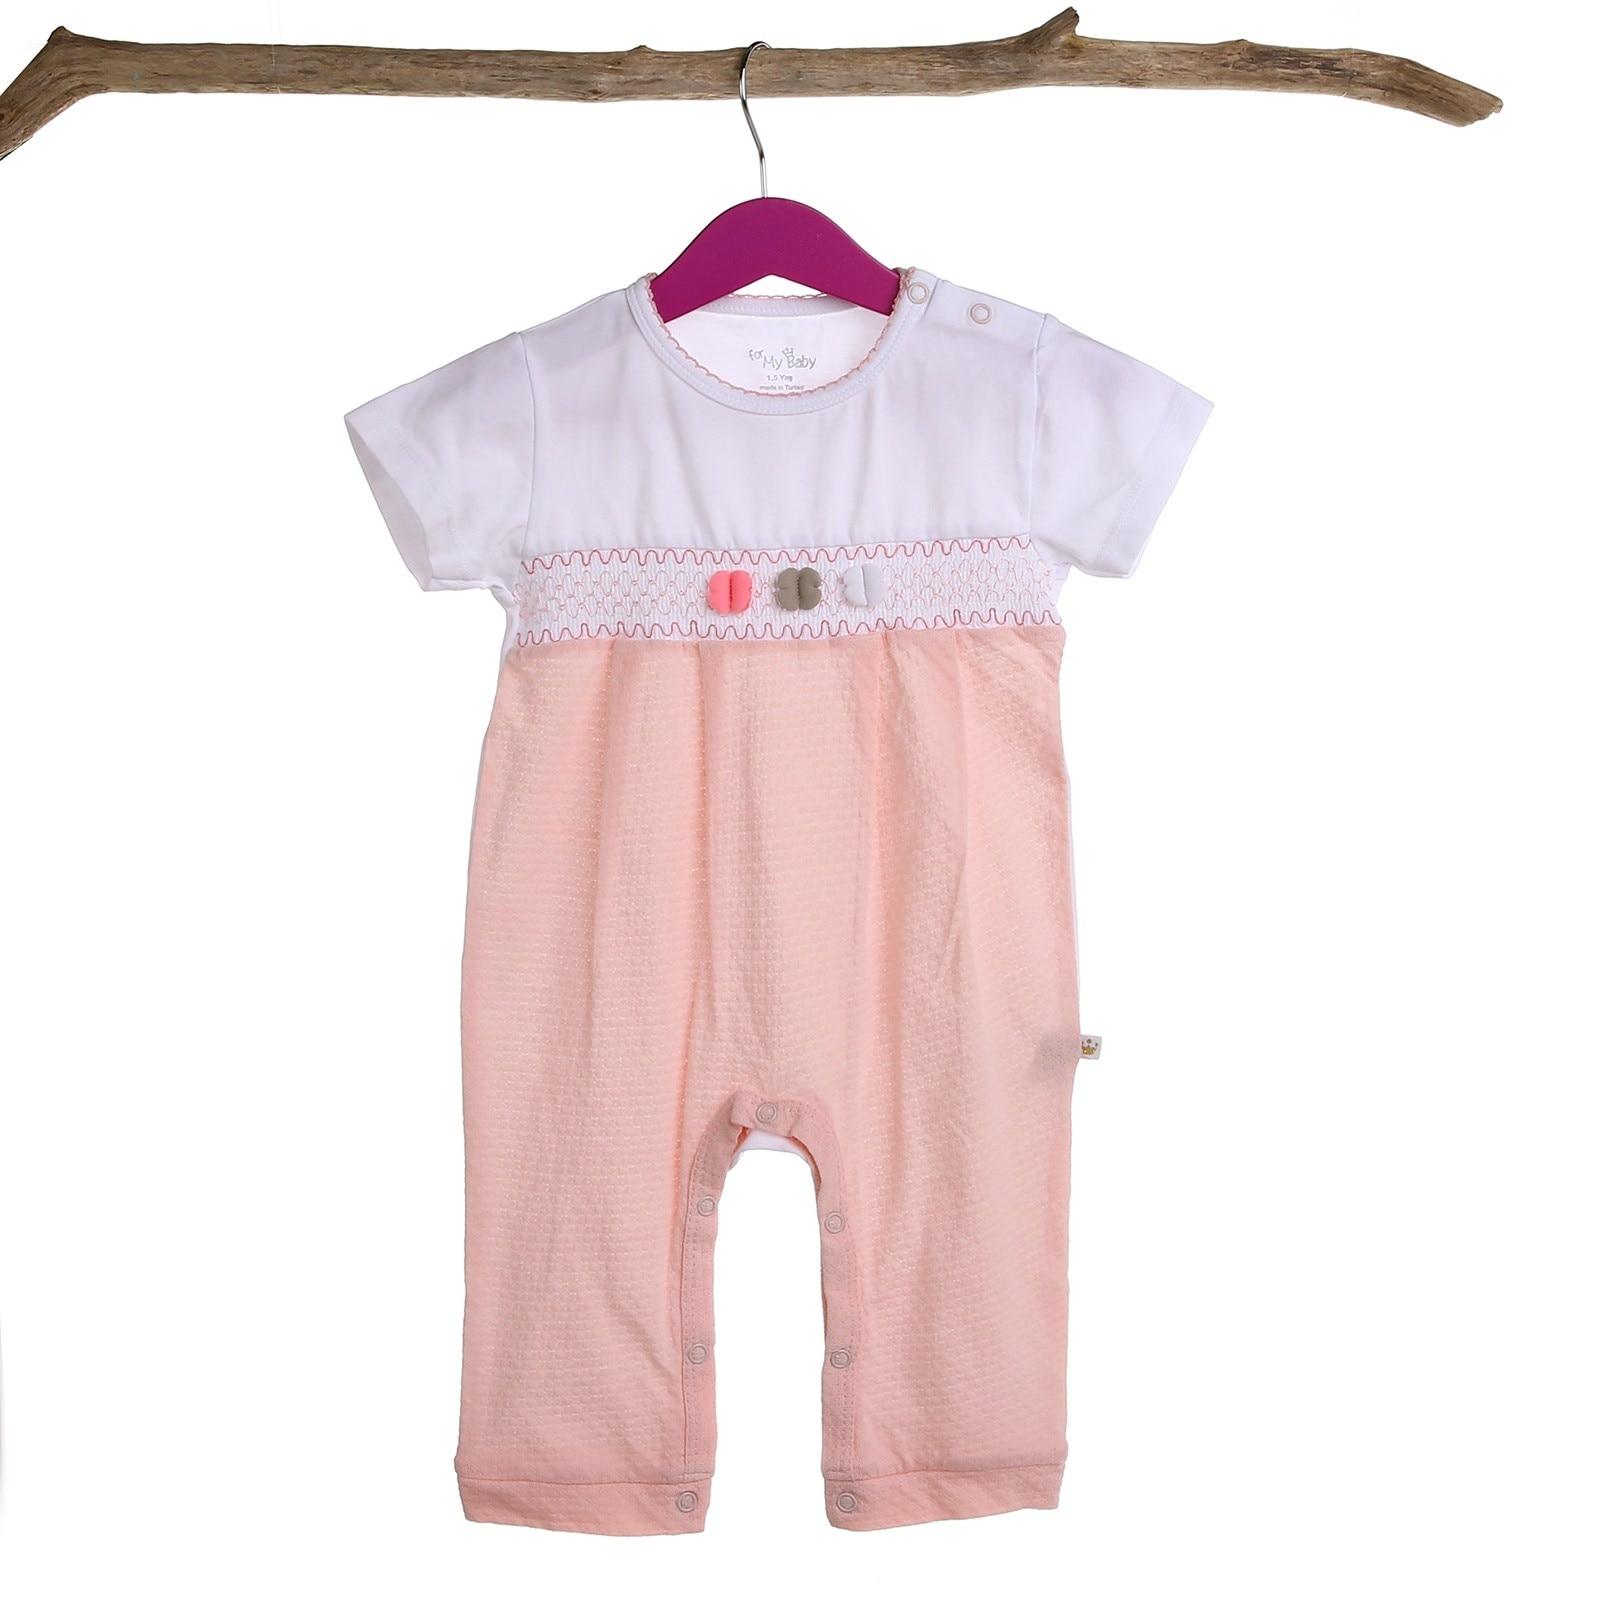 Ebebek For My Baby Anarosa Girl Rib Short Sleeve Romper